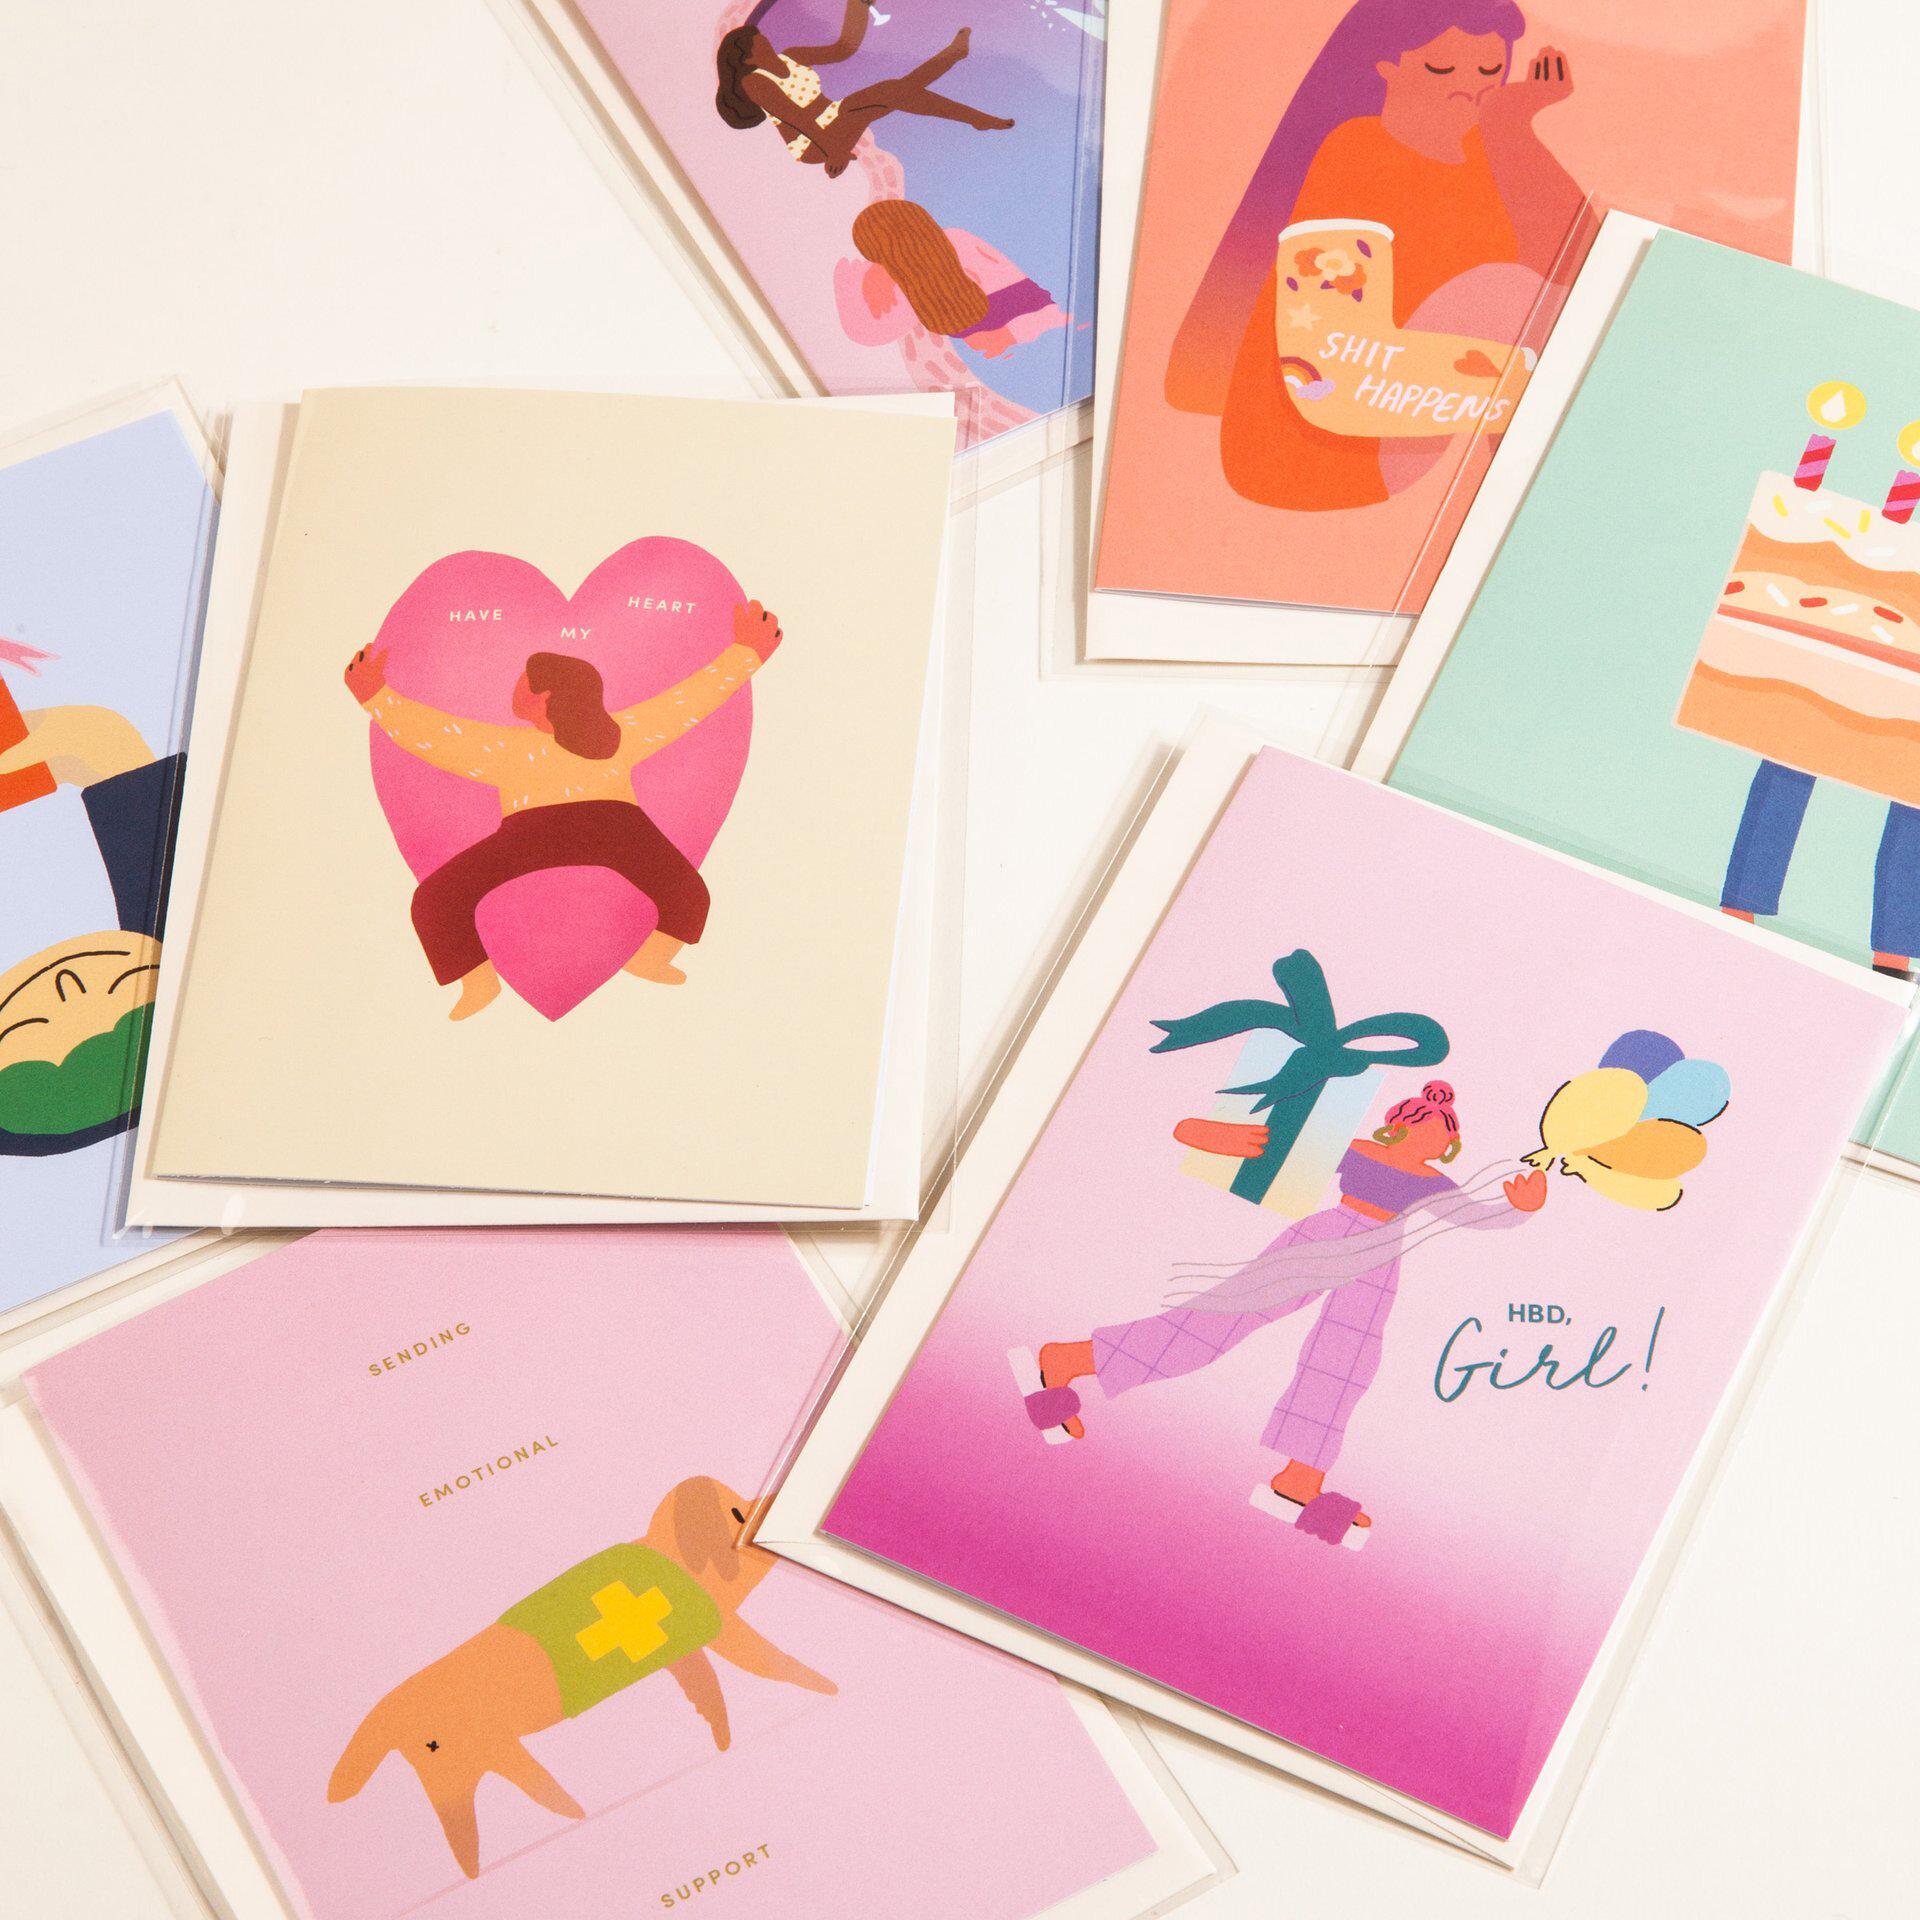 2019-Greeting-Card-Collection_2400_11a916b5-3c65-48c1-8431-a39ee0f62e6d_1920x.jpg